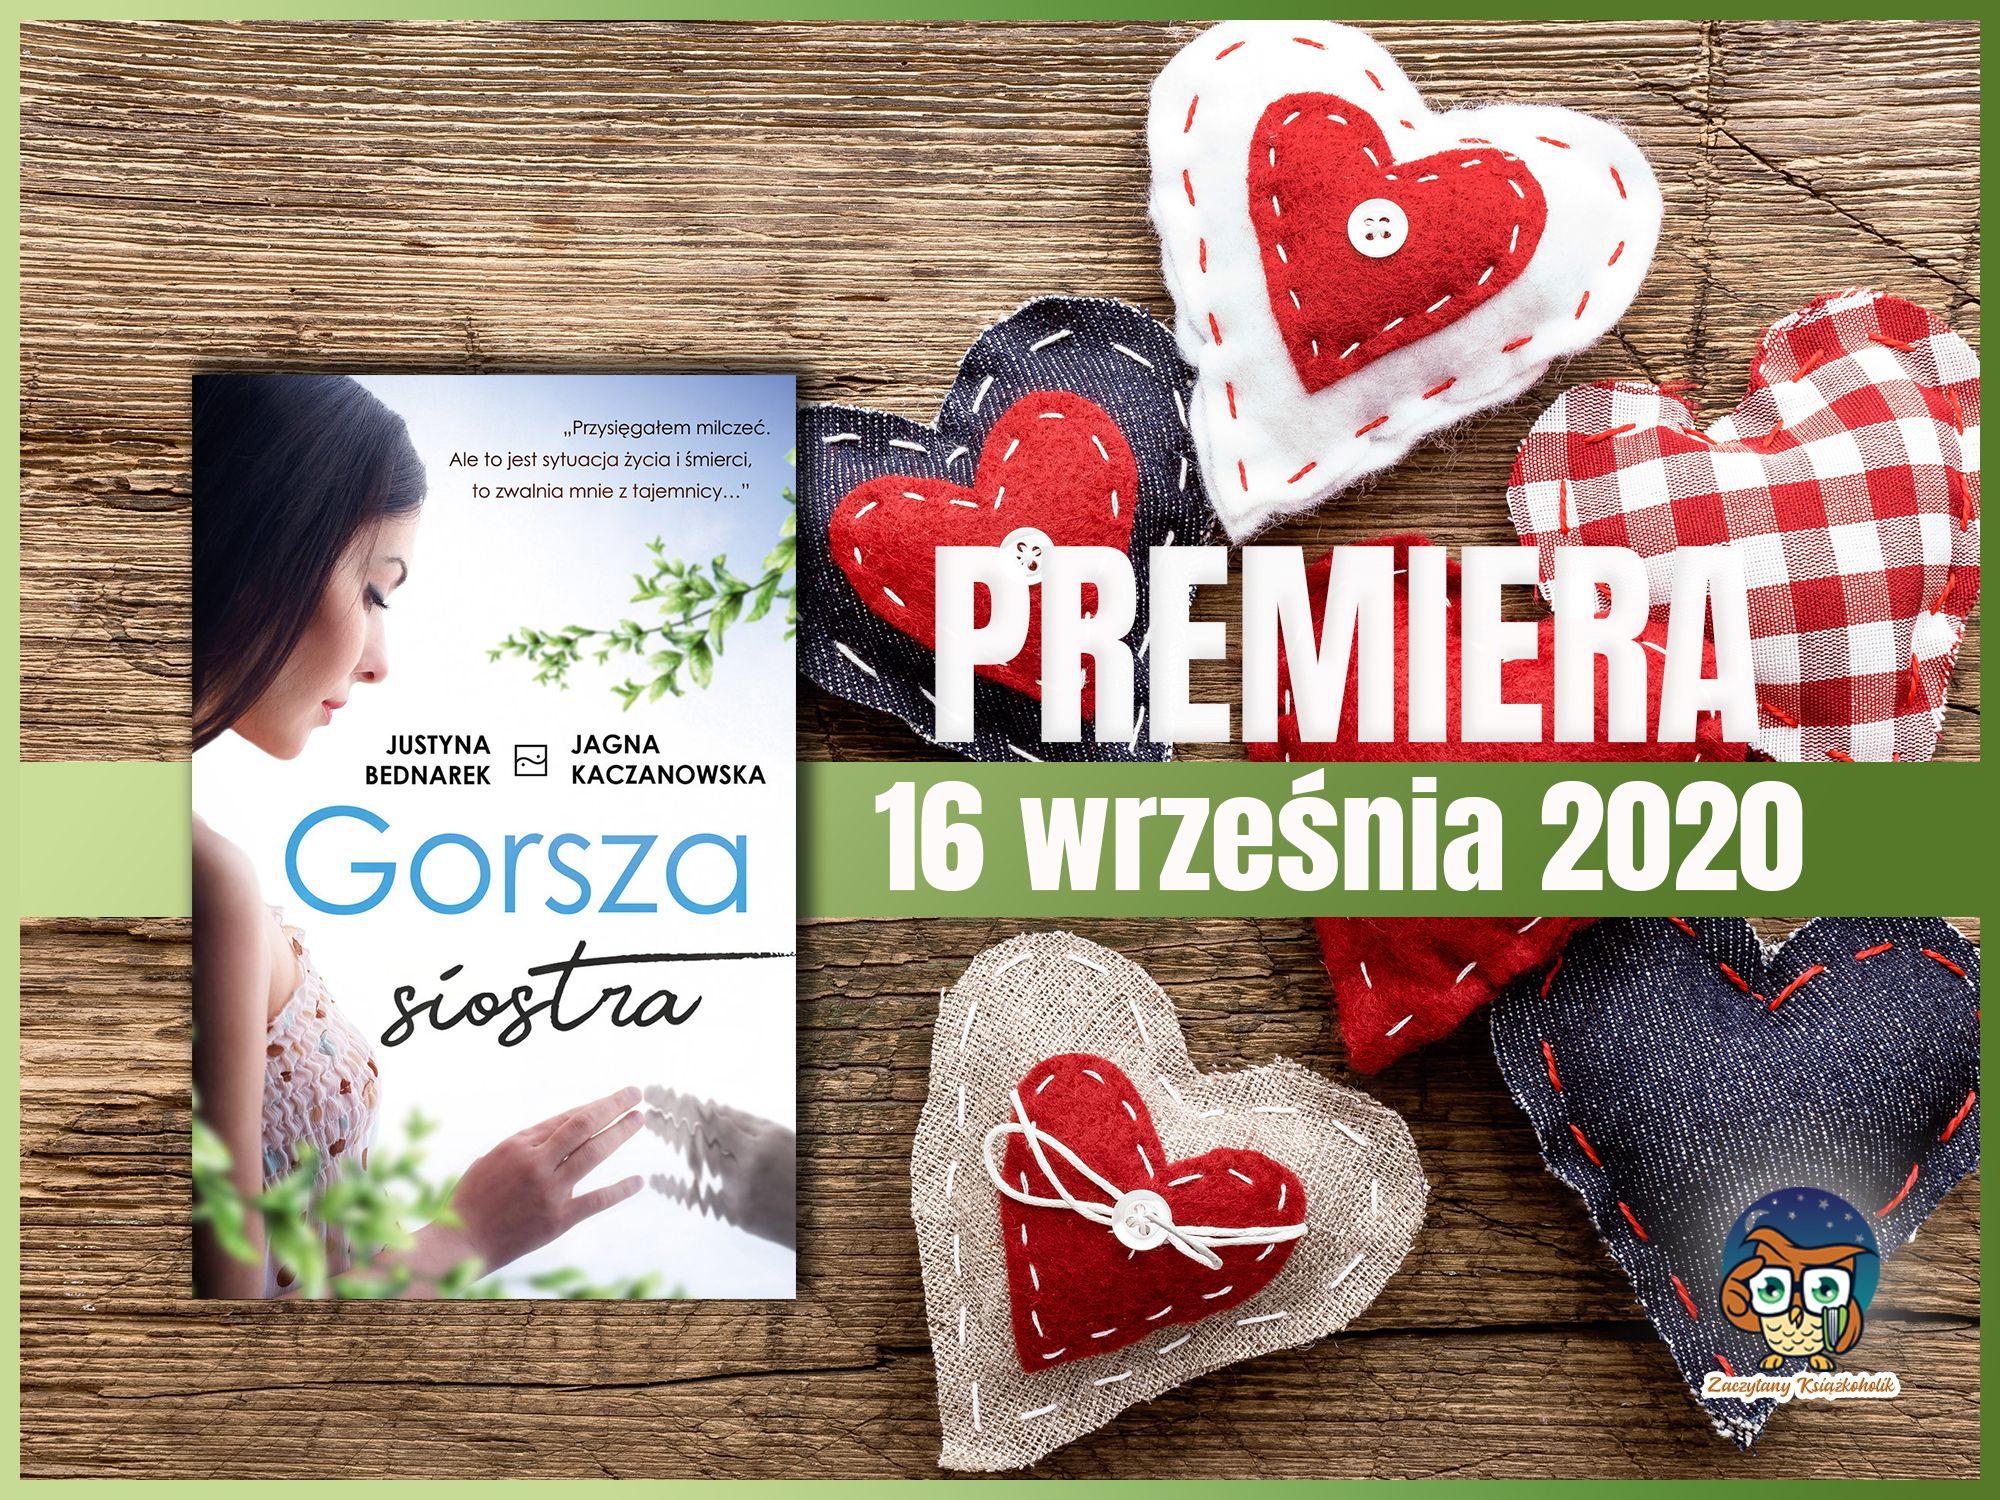 """Gorsza Siostra"", Justyna Bednarek, Jagna Kaczanowska"